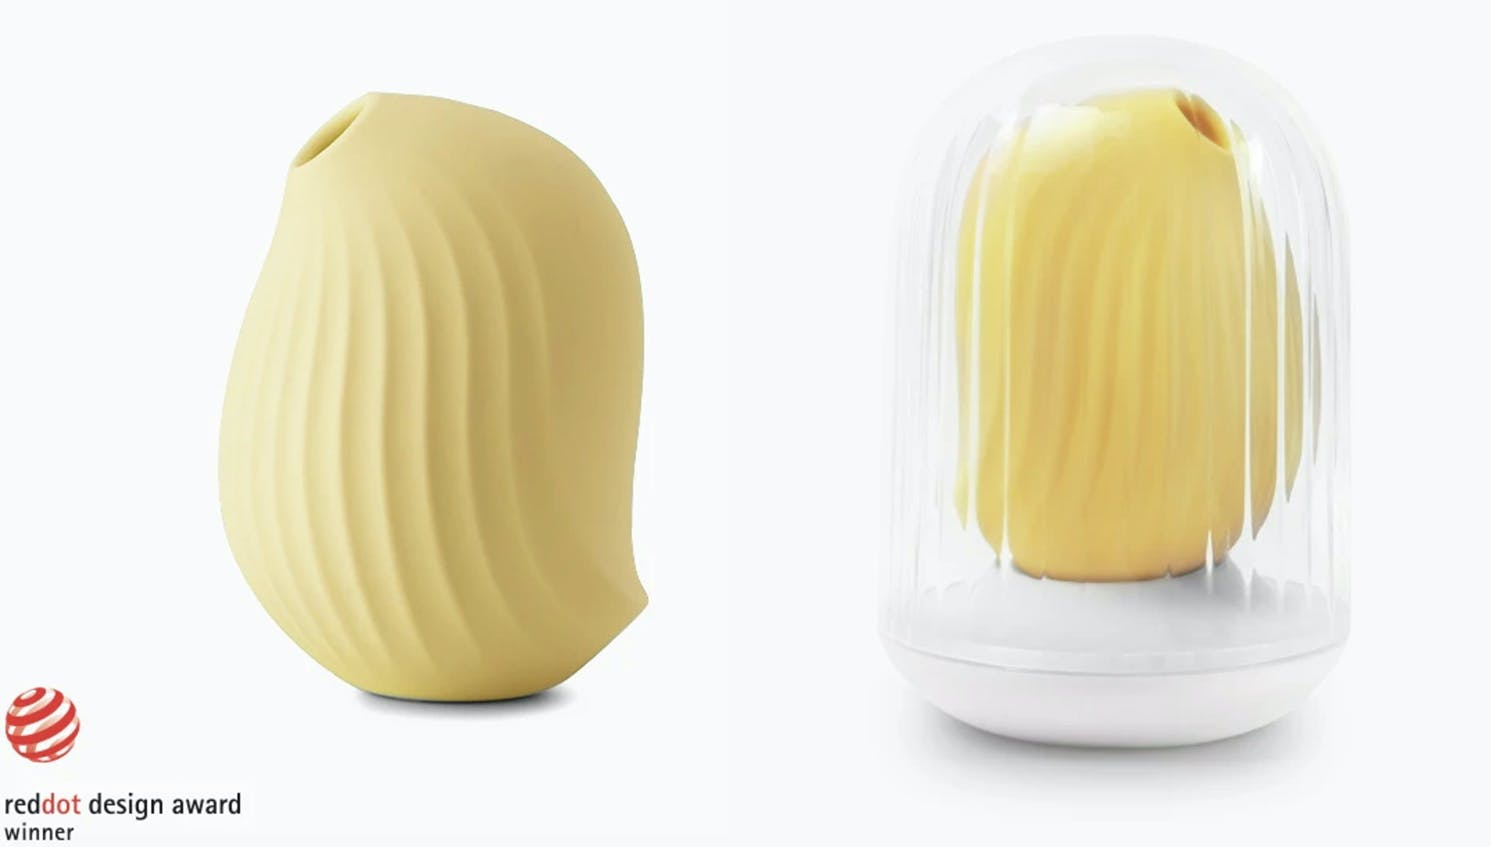 clit sucking vibrator